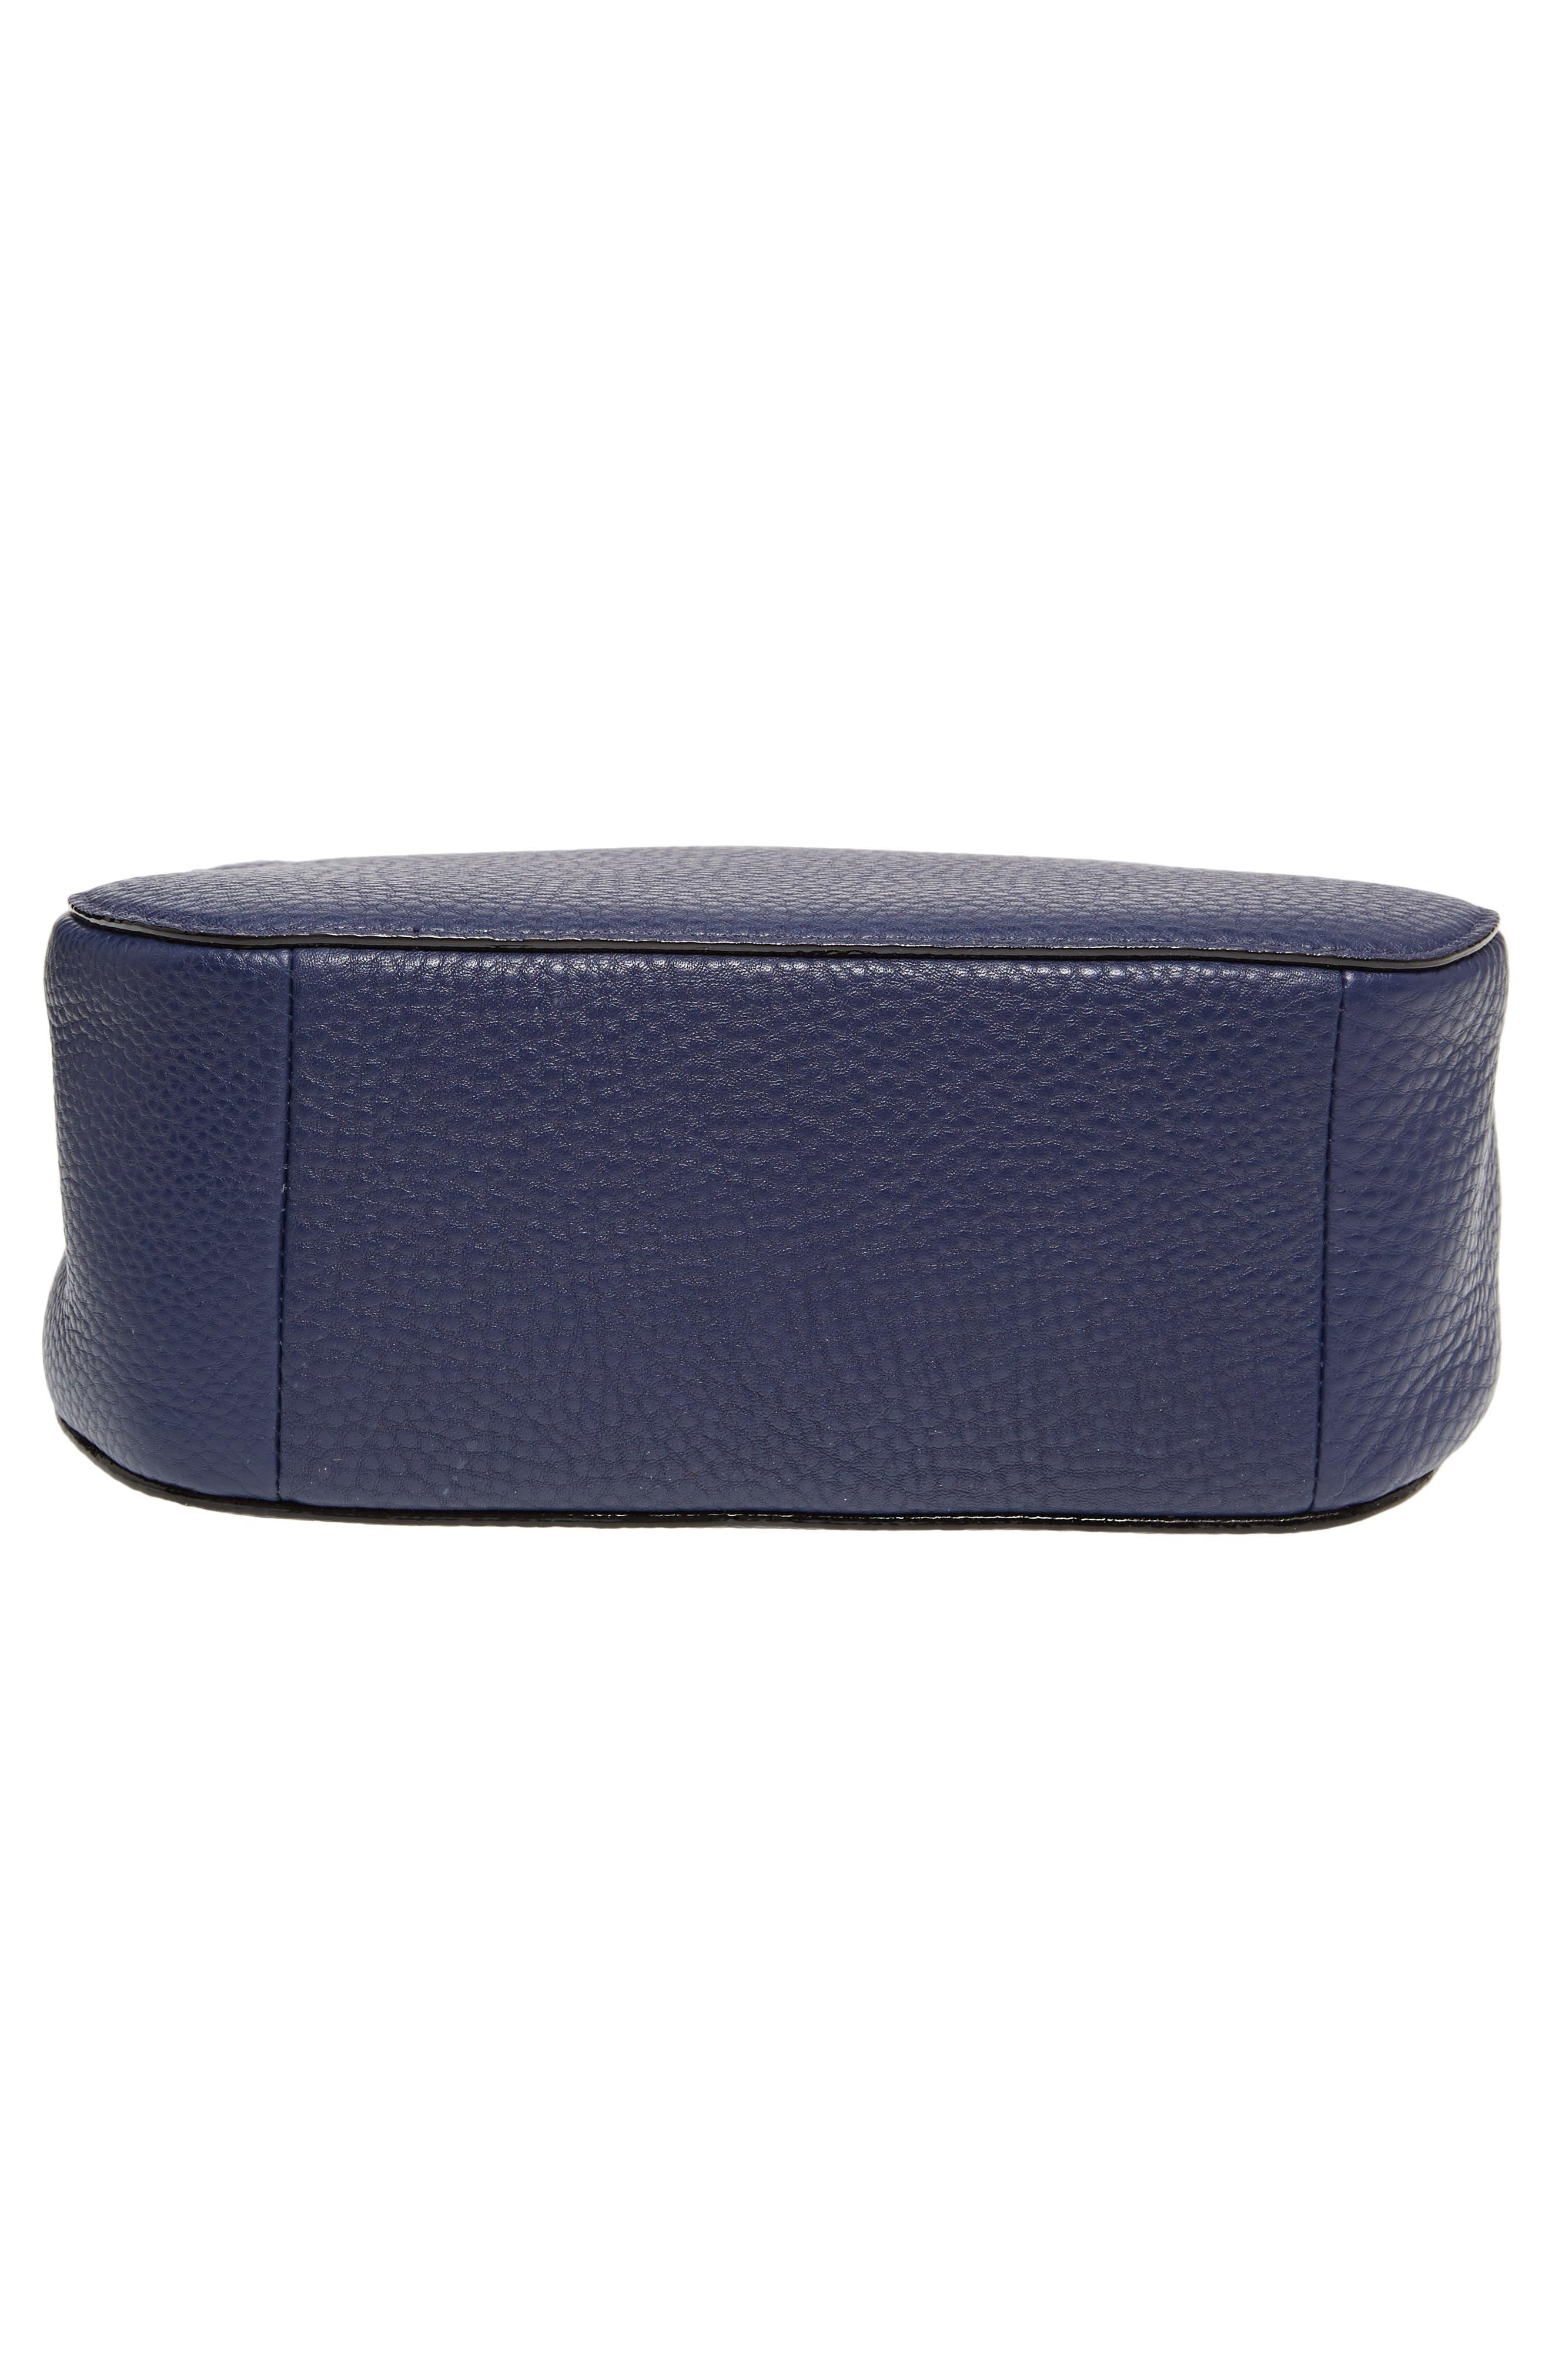 carlyle street - justina leather satchel,                             Alternate thumbnail 6, color,                             Blue Ridge